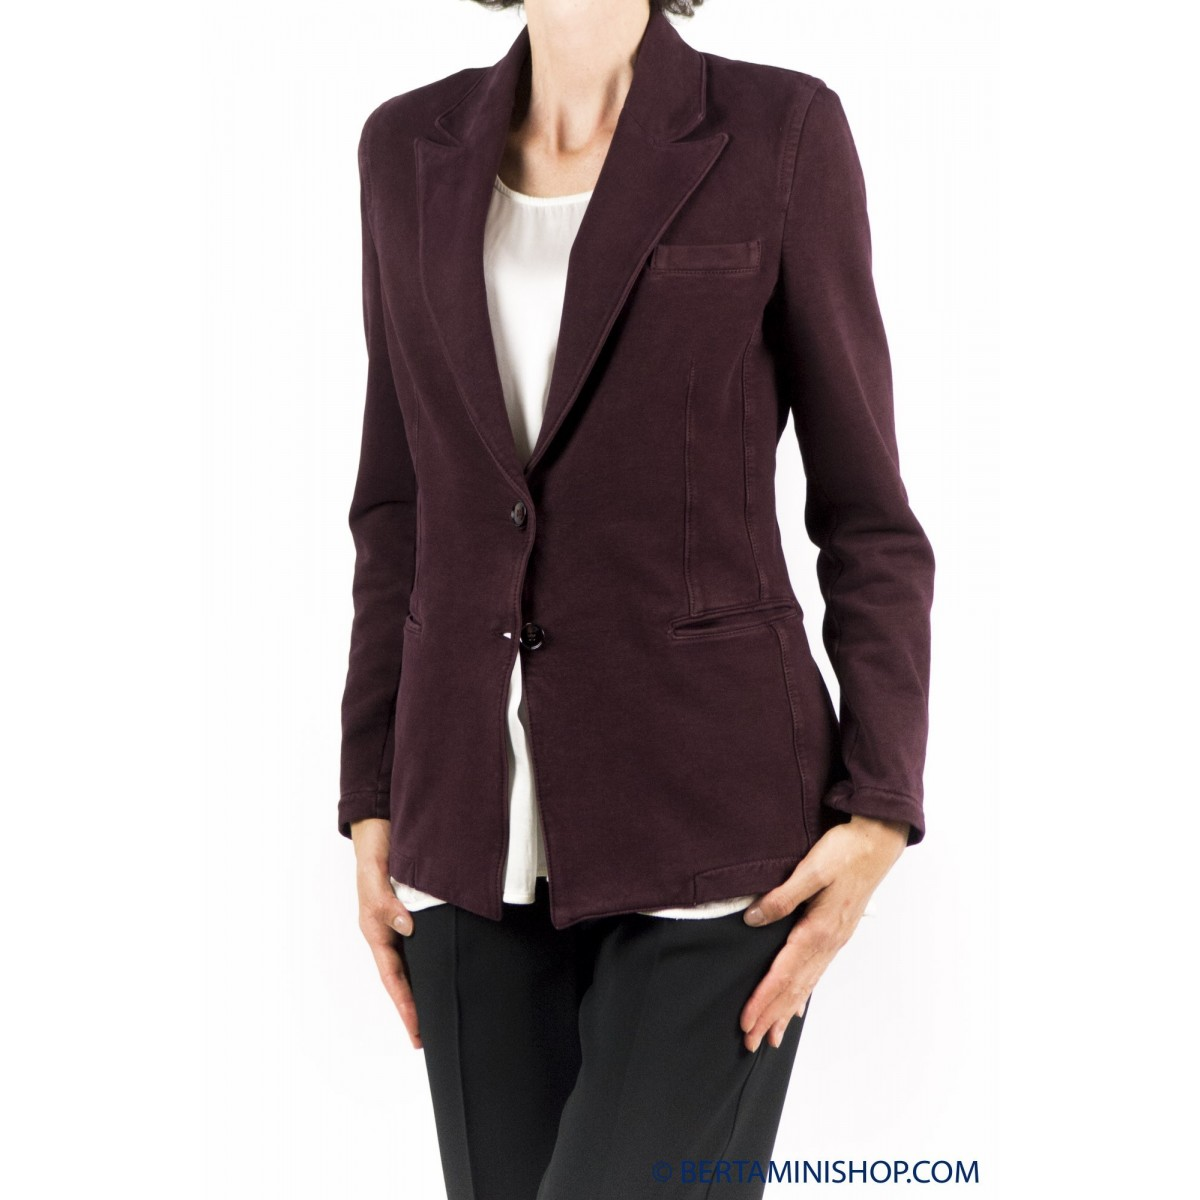 Giacca donna Circolo 1901 - Fd464 giacca lunga punta lancia 5203 - Ribes